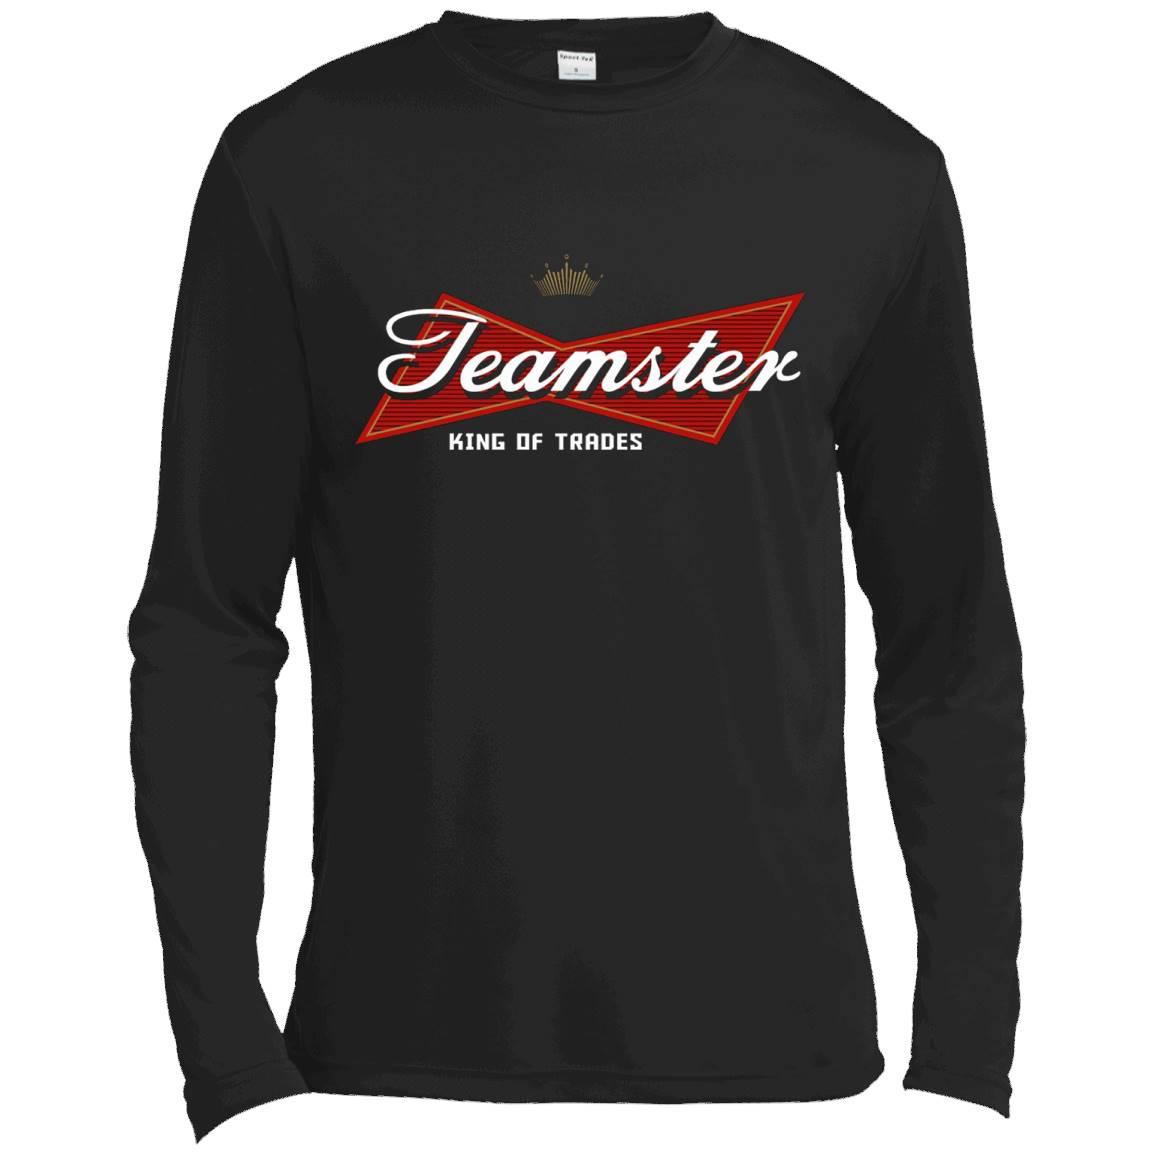 Teamster King of Trades T-shirt – Long Sleeve Tee